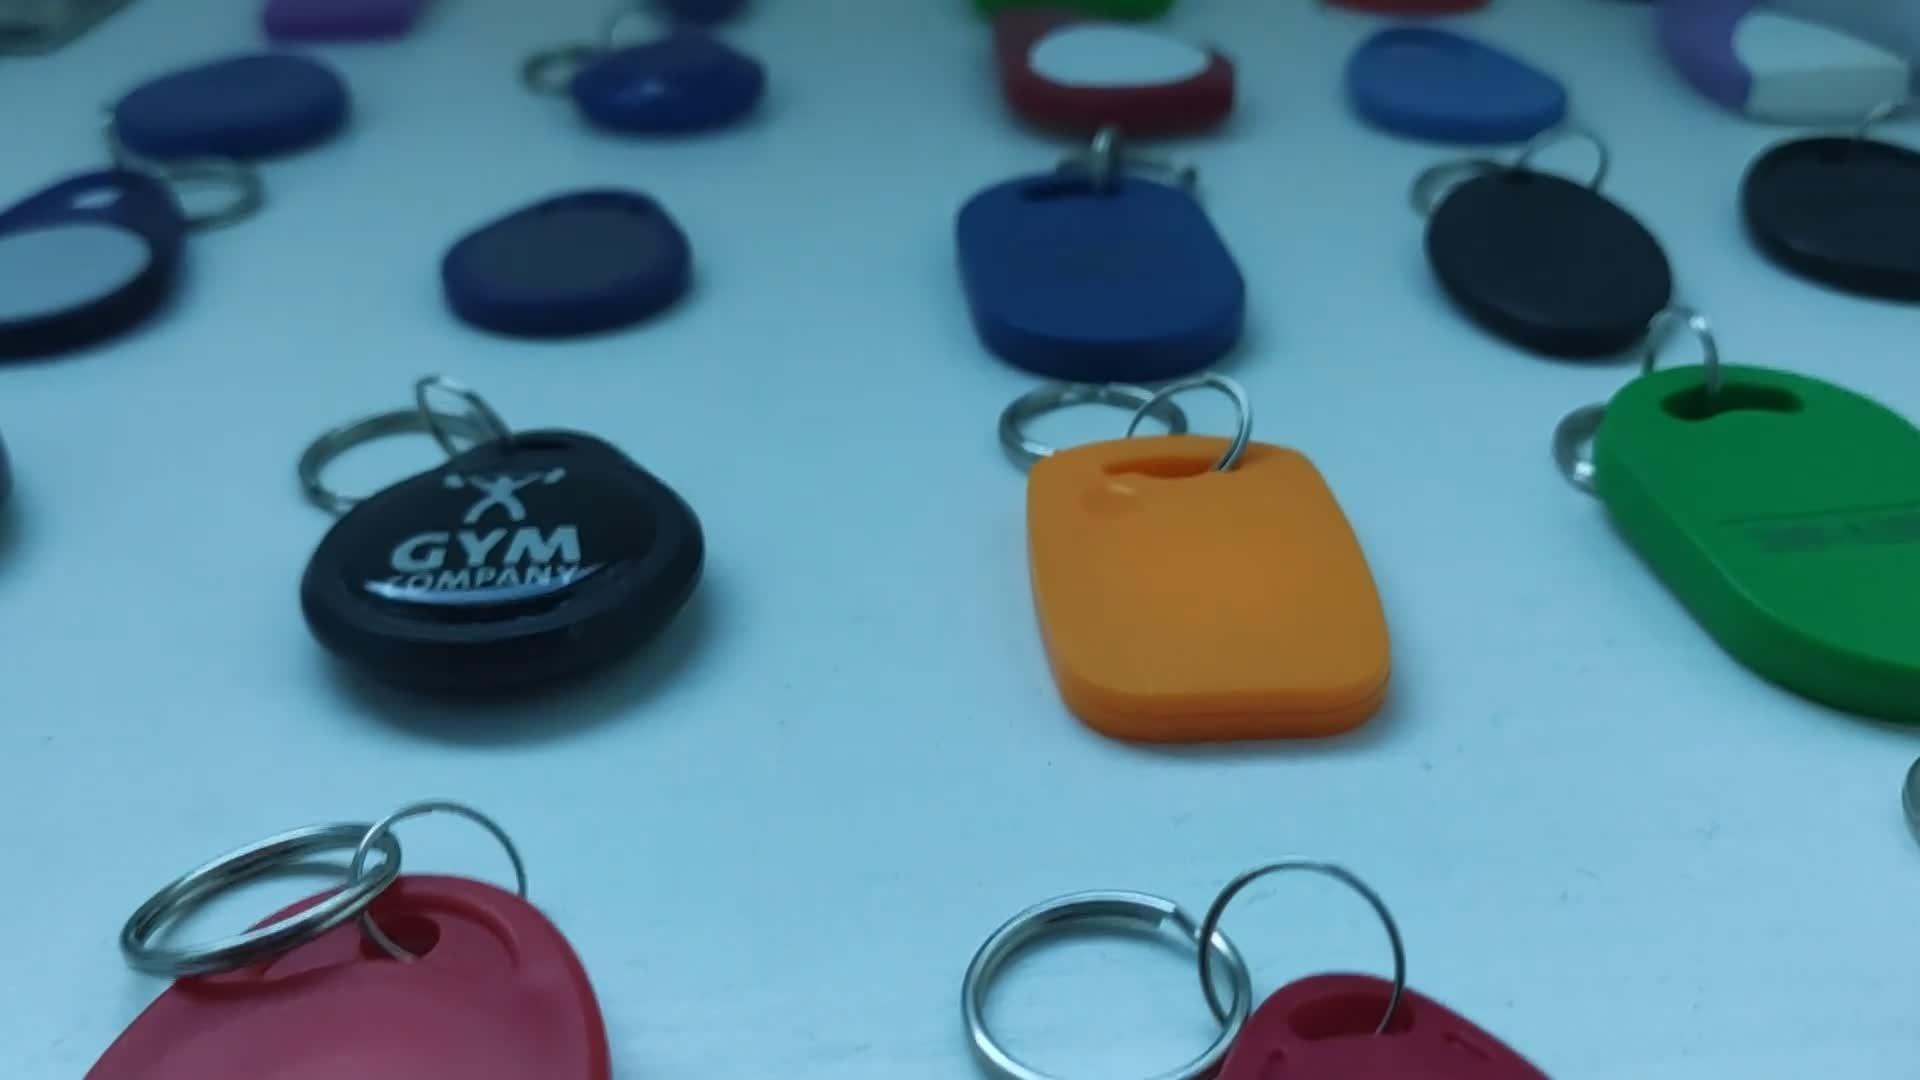 EM4305 125Khz कुंजी Copire रीराइटेबल लिखने योग्य फिर से लिखना ईएम आईडी T5577 keyfobs आरएफआईडी टैग अंगूठी कार्ड निकटता टोकन अभिगम डुप्लीकेट